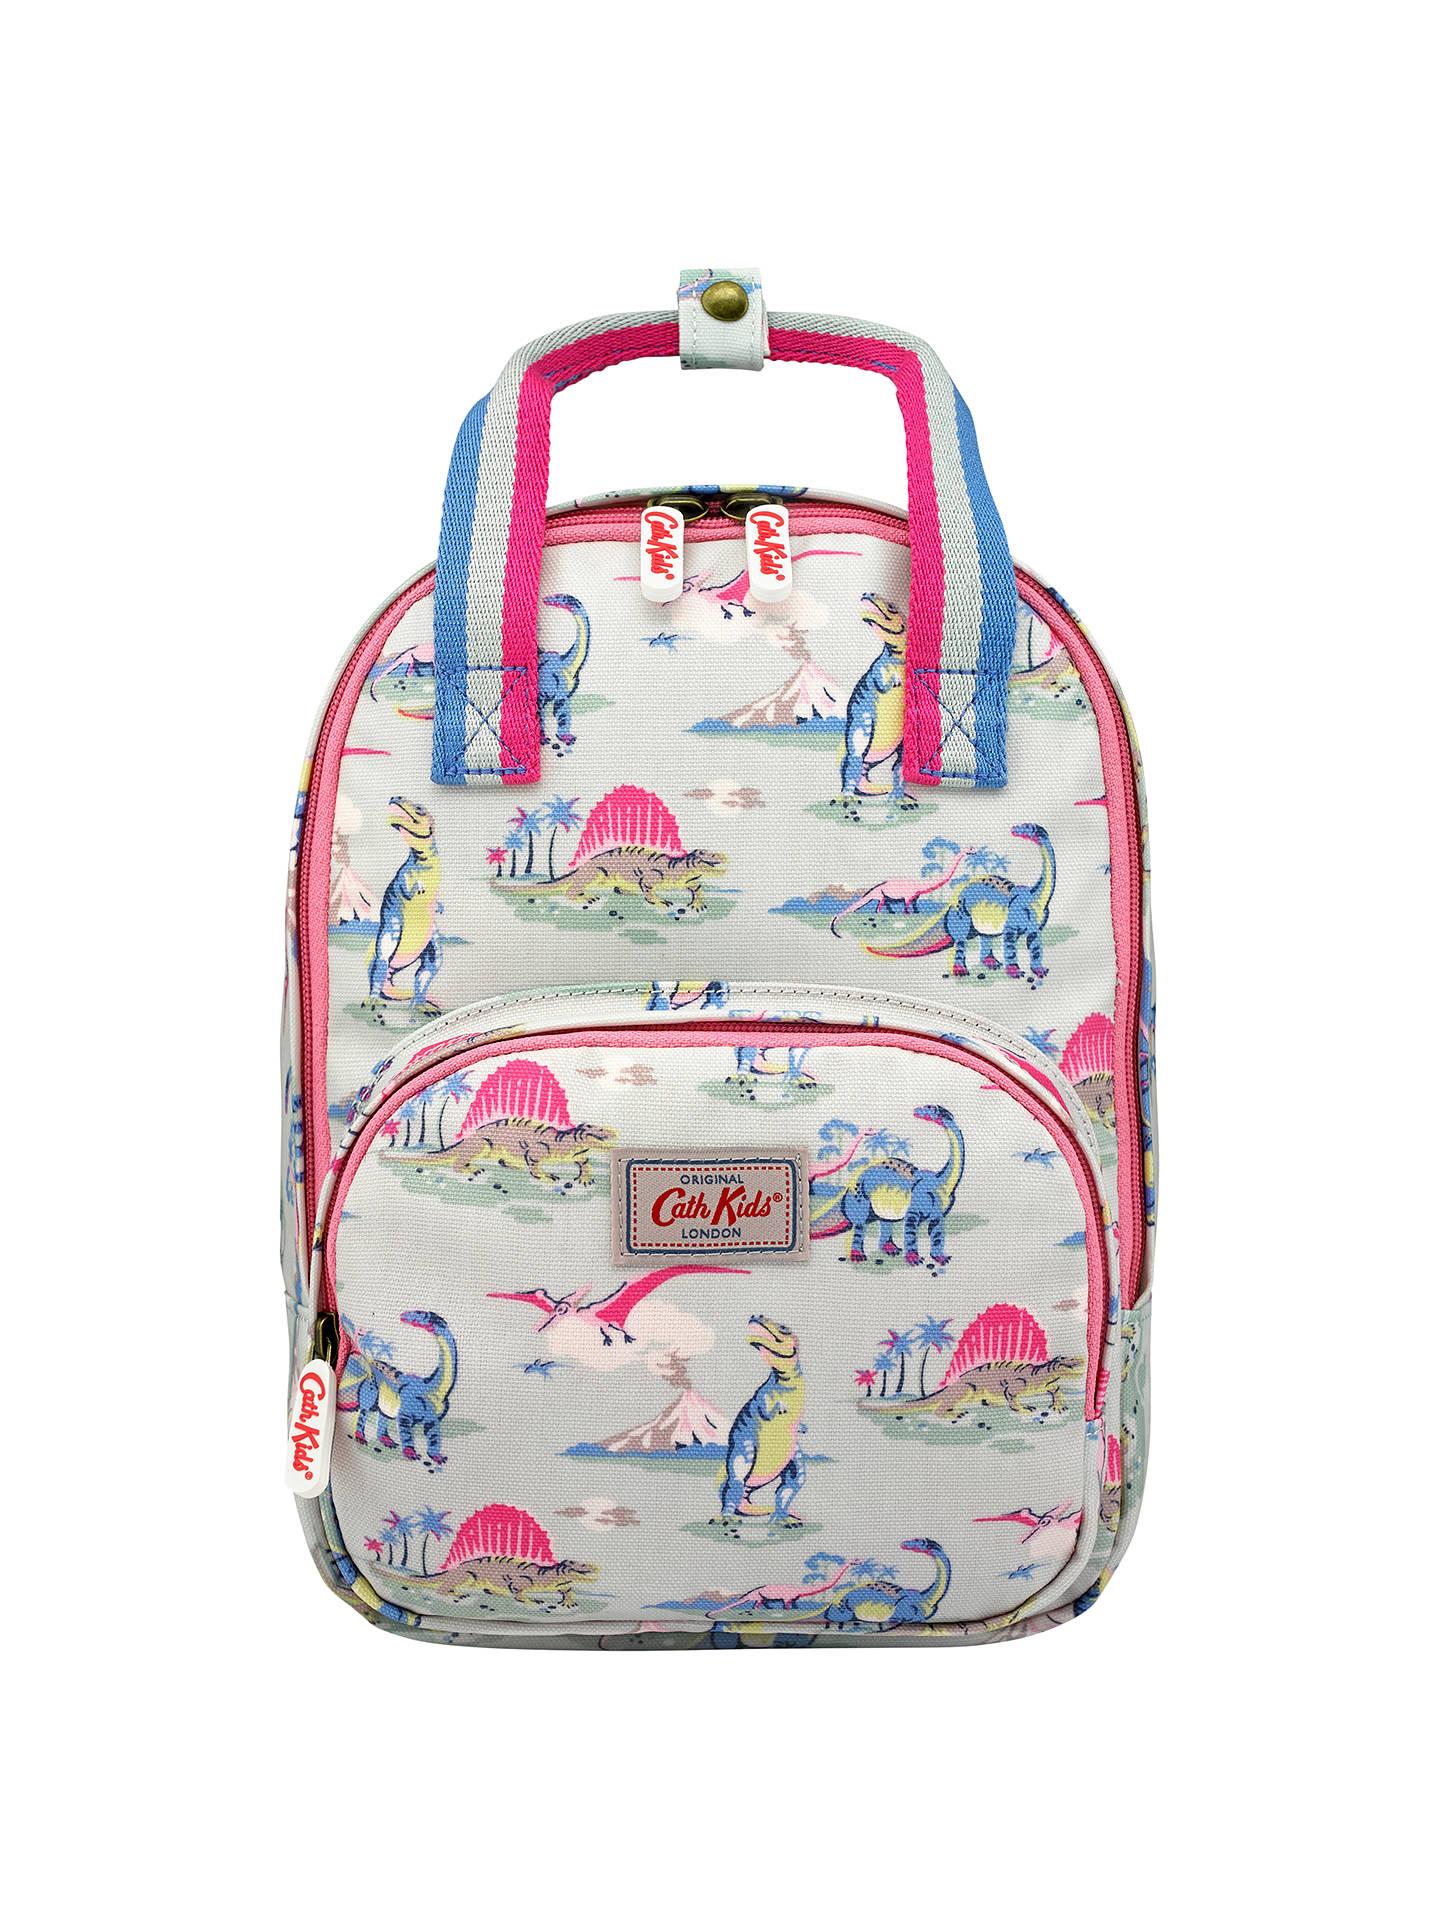 5b022adfaf Buy Cath Kidston Children s Dinosaur Print Medium Backpack